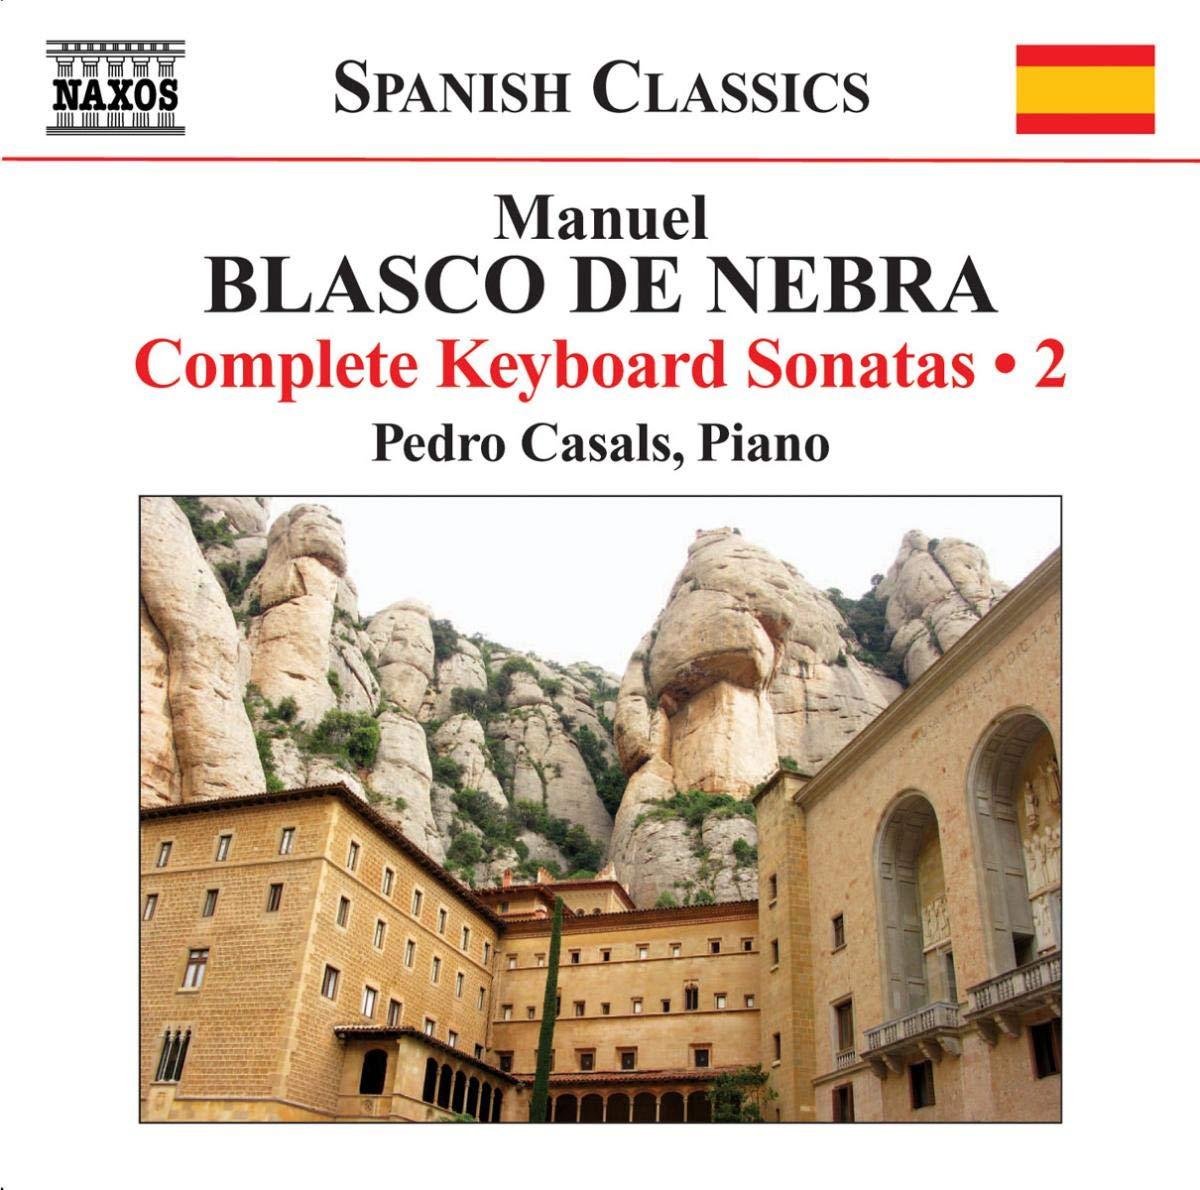 Sonates Pour Clavier /Vol.2: Pedro Casals, Manuel Blasco De Nebra: Amazon.es: Música